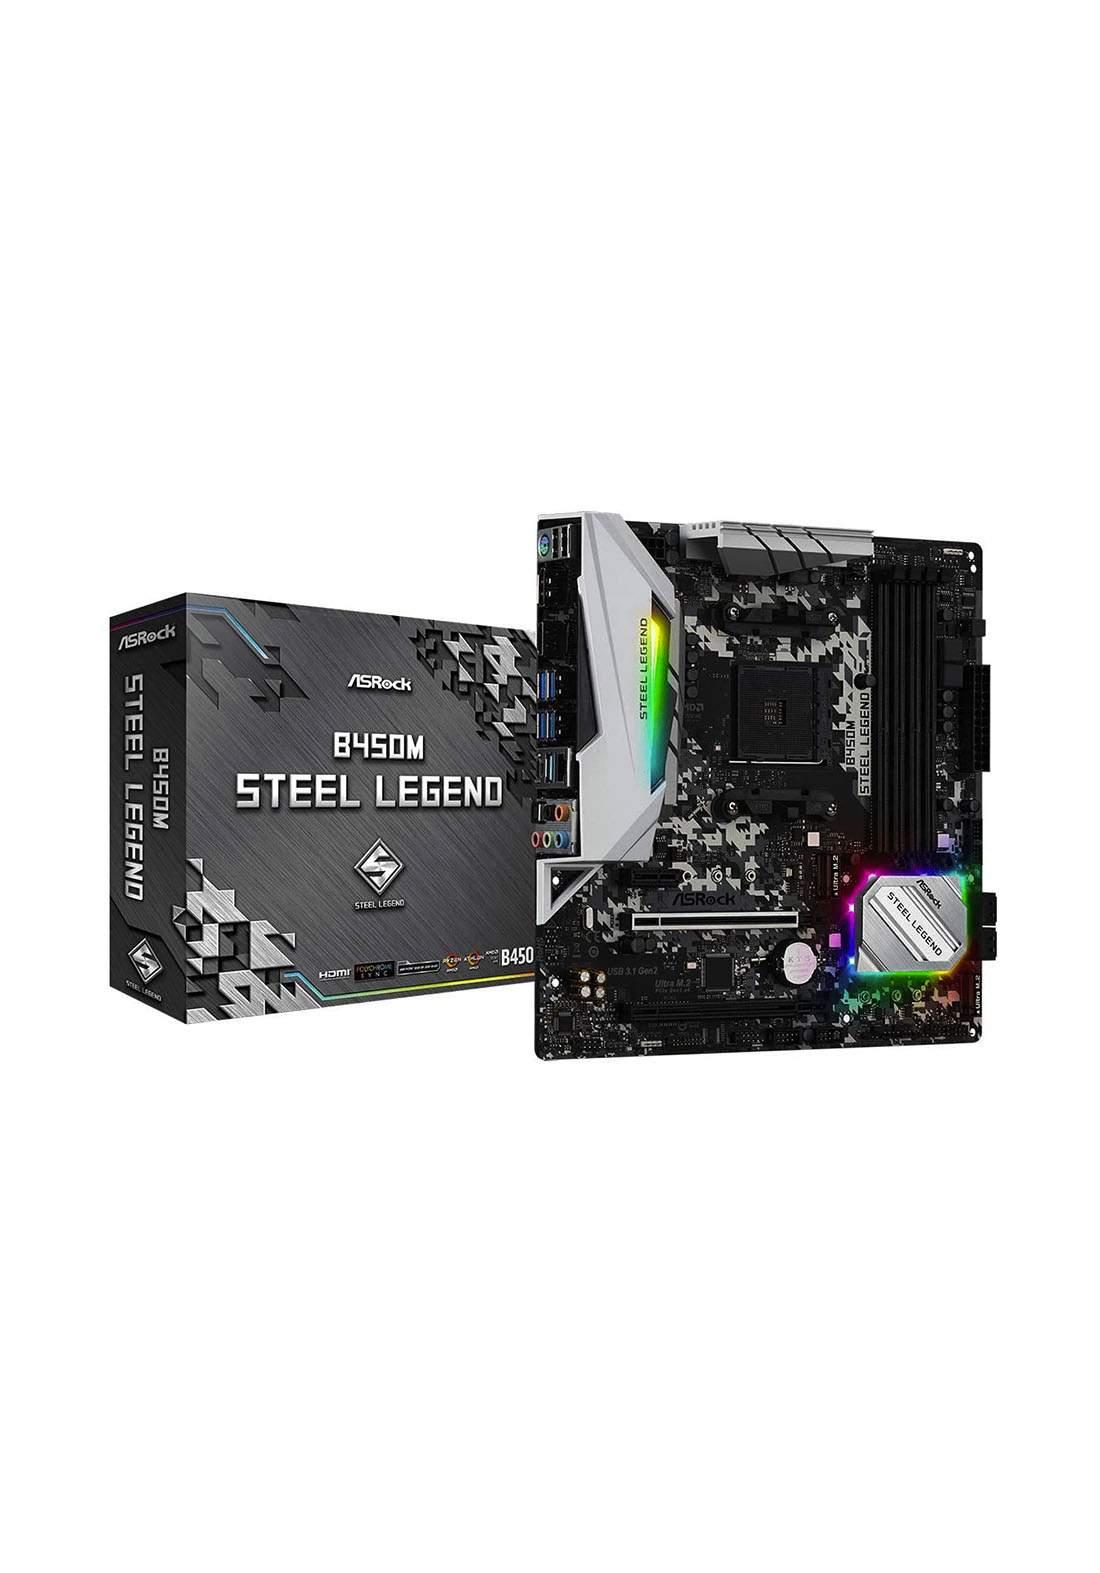 AsrocK B450M Steel Legend Motherboard -Black  لوحة الام